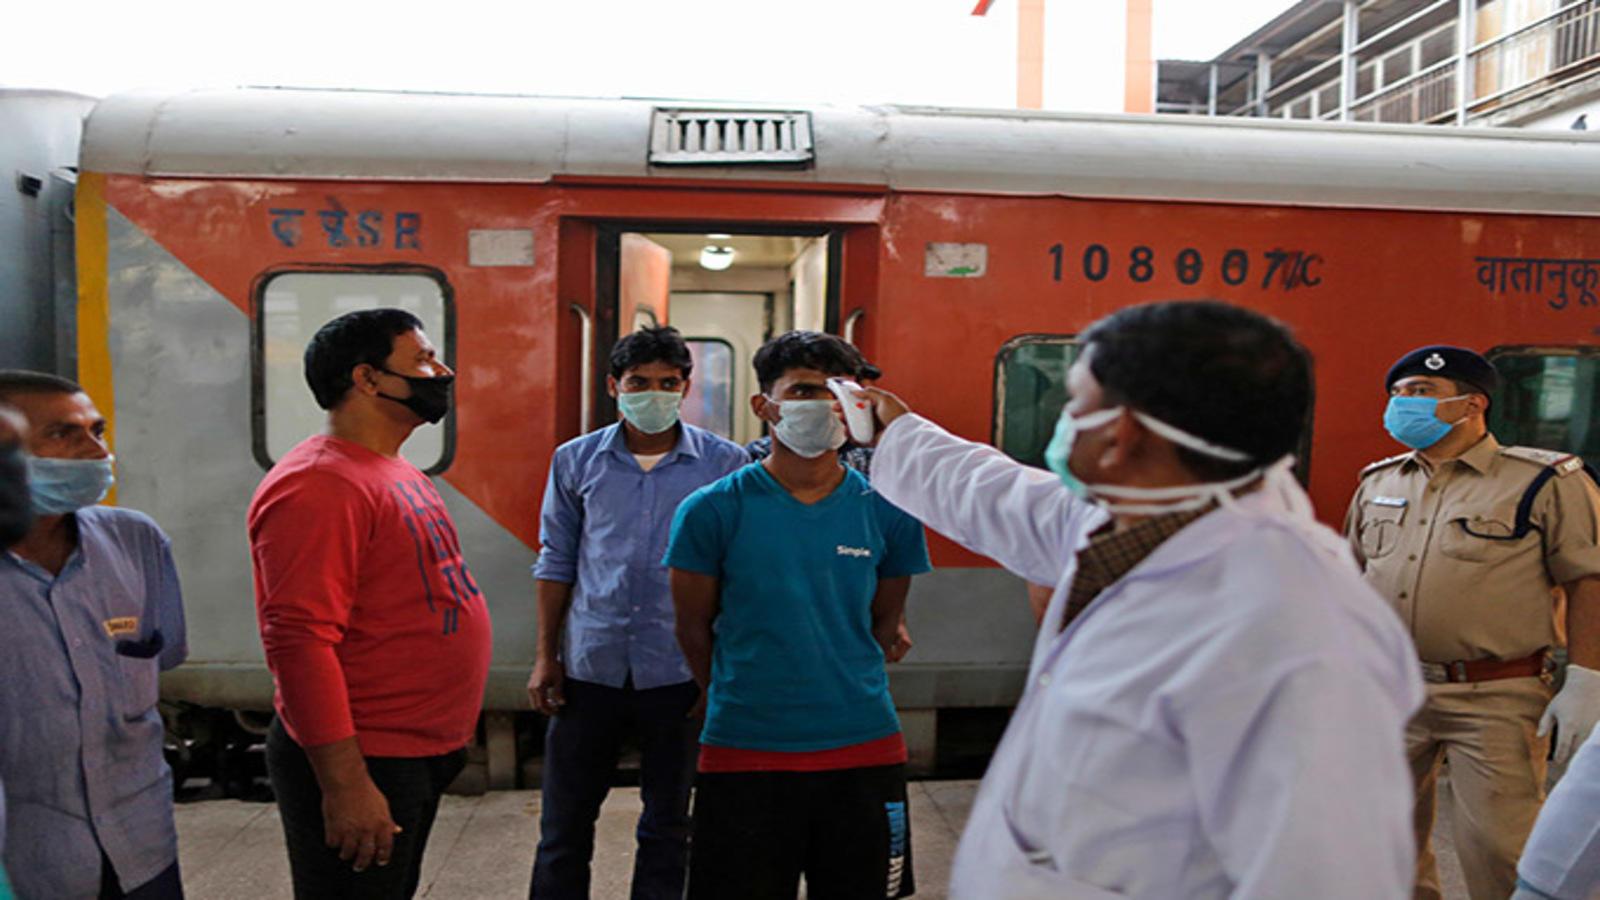 Indian Railways services suspended | India in Lockdown-2: Railways ...